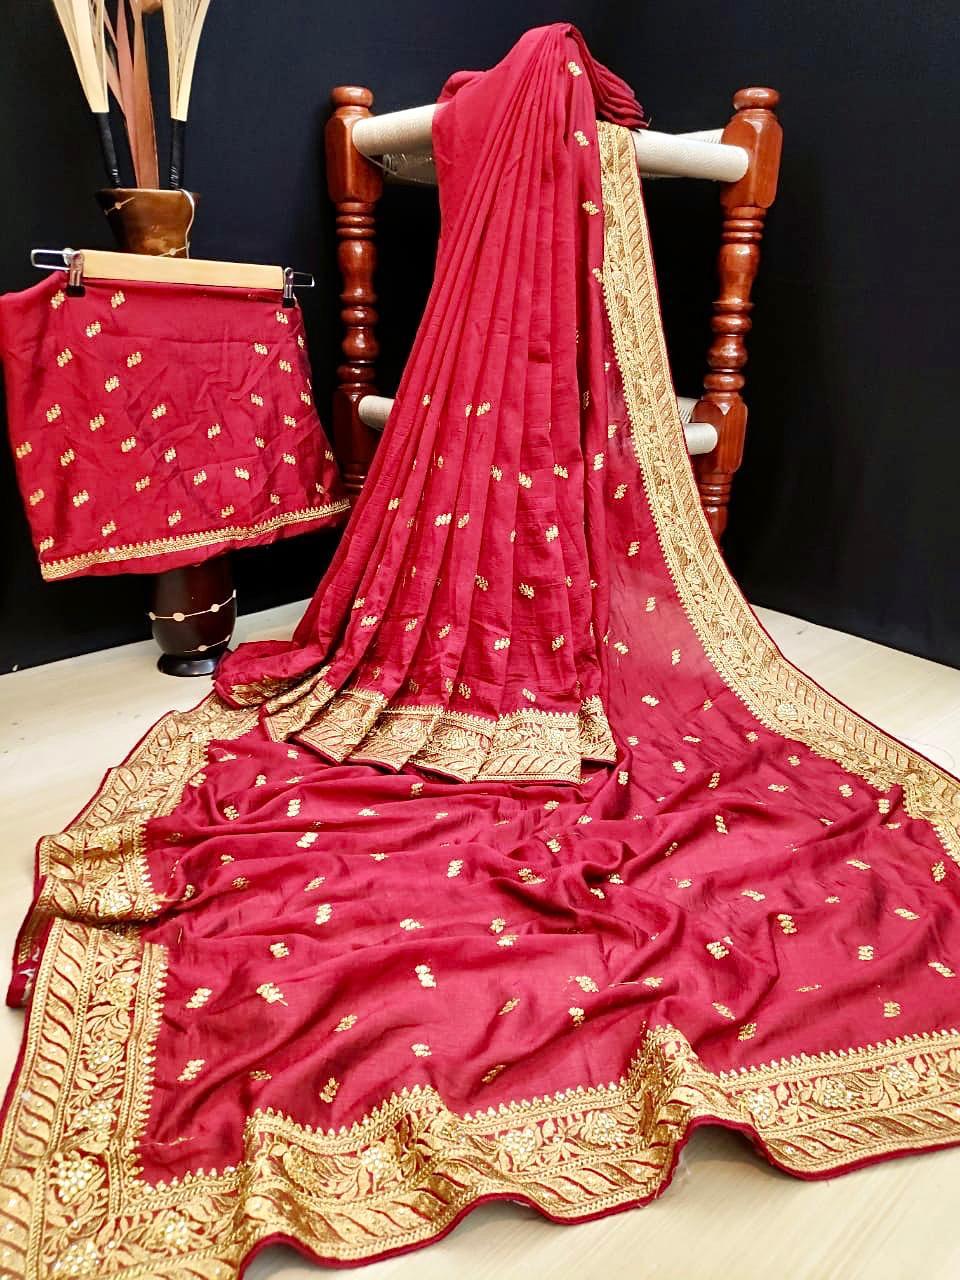 Thankar Lovely Designer Vichitra Silk Embroidered saree Catalog at Wholesale rate Thankar Lovely Designer Vichitra Silk Embroidered saree Catalog at Wholesale rate